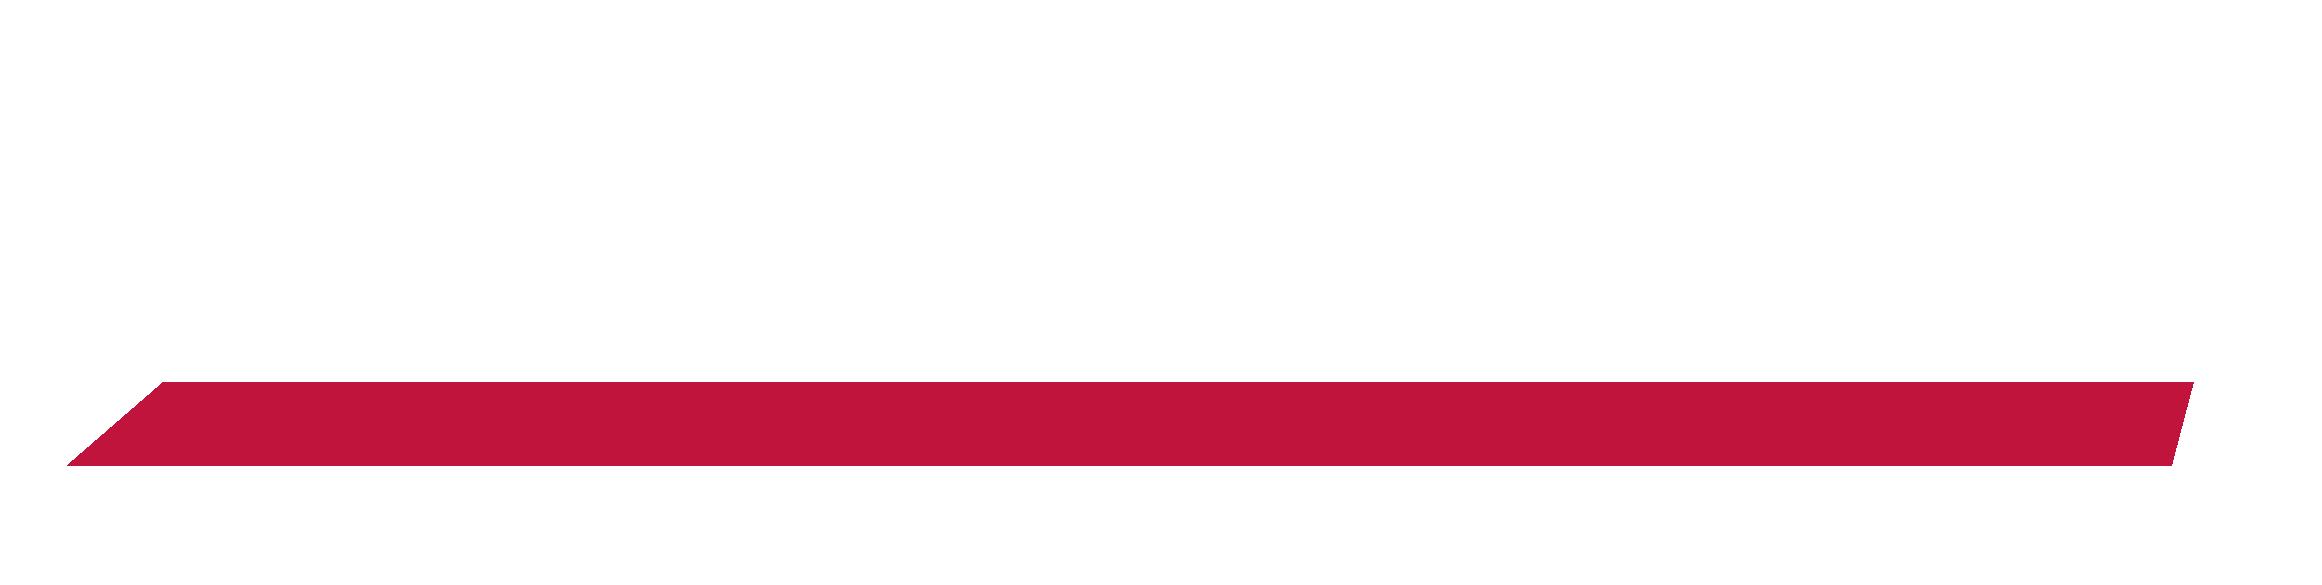 Control Systems Raven 4400 Wiring Diagram Logo